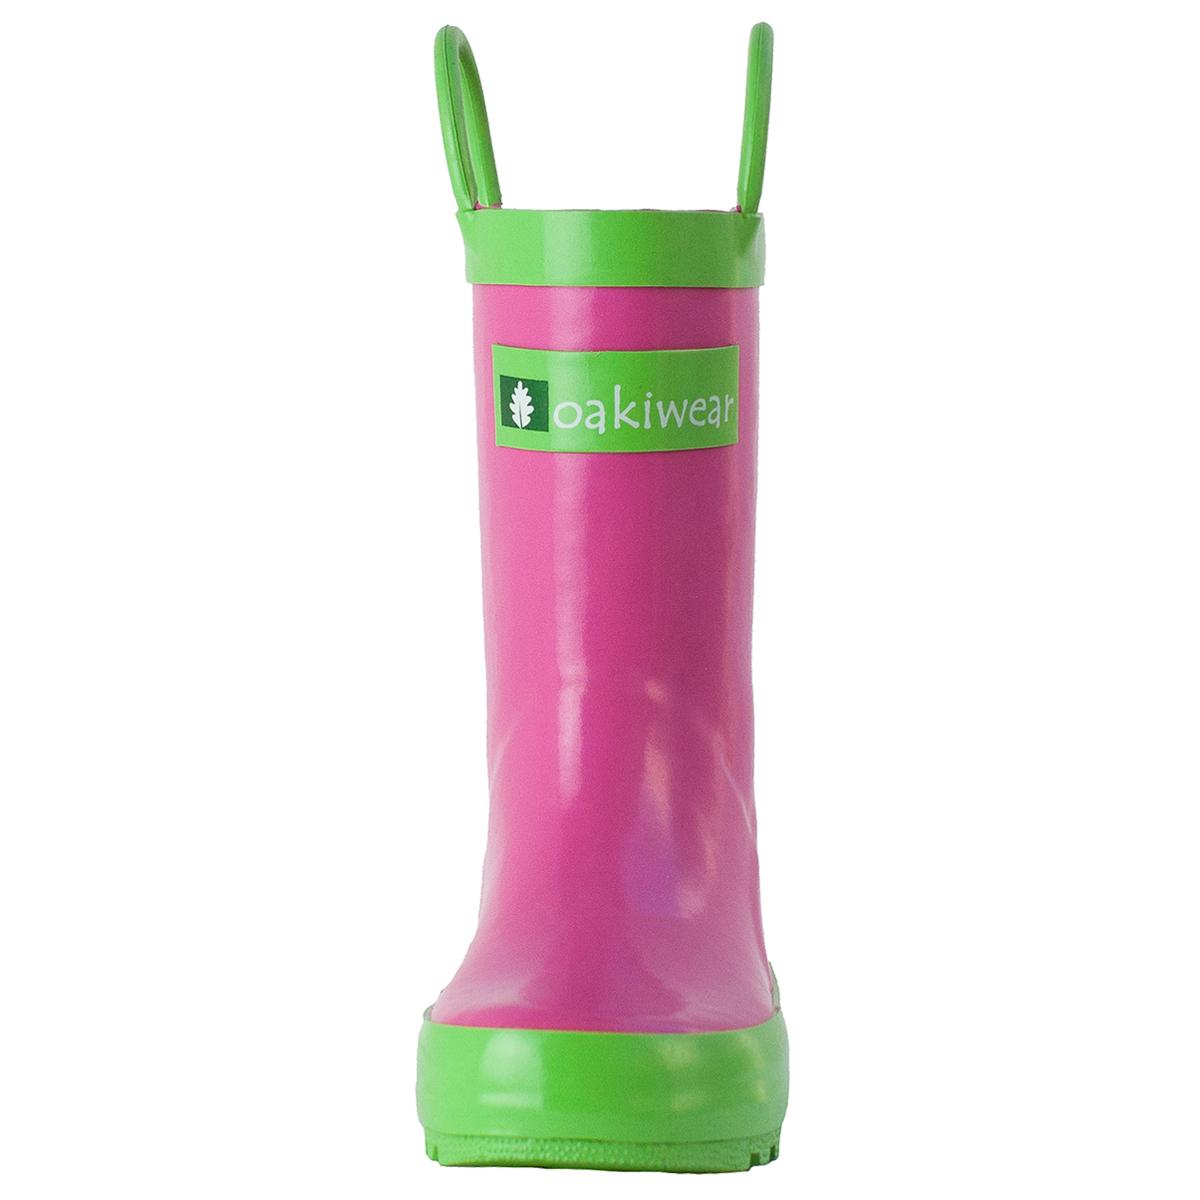 Oakiwear-Waterproof-Kids-Rubber-Rain-Boots-Boy-amp-Girl-Toddler-Shoes-With-Handles thumbnail 26